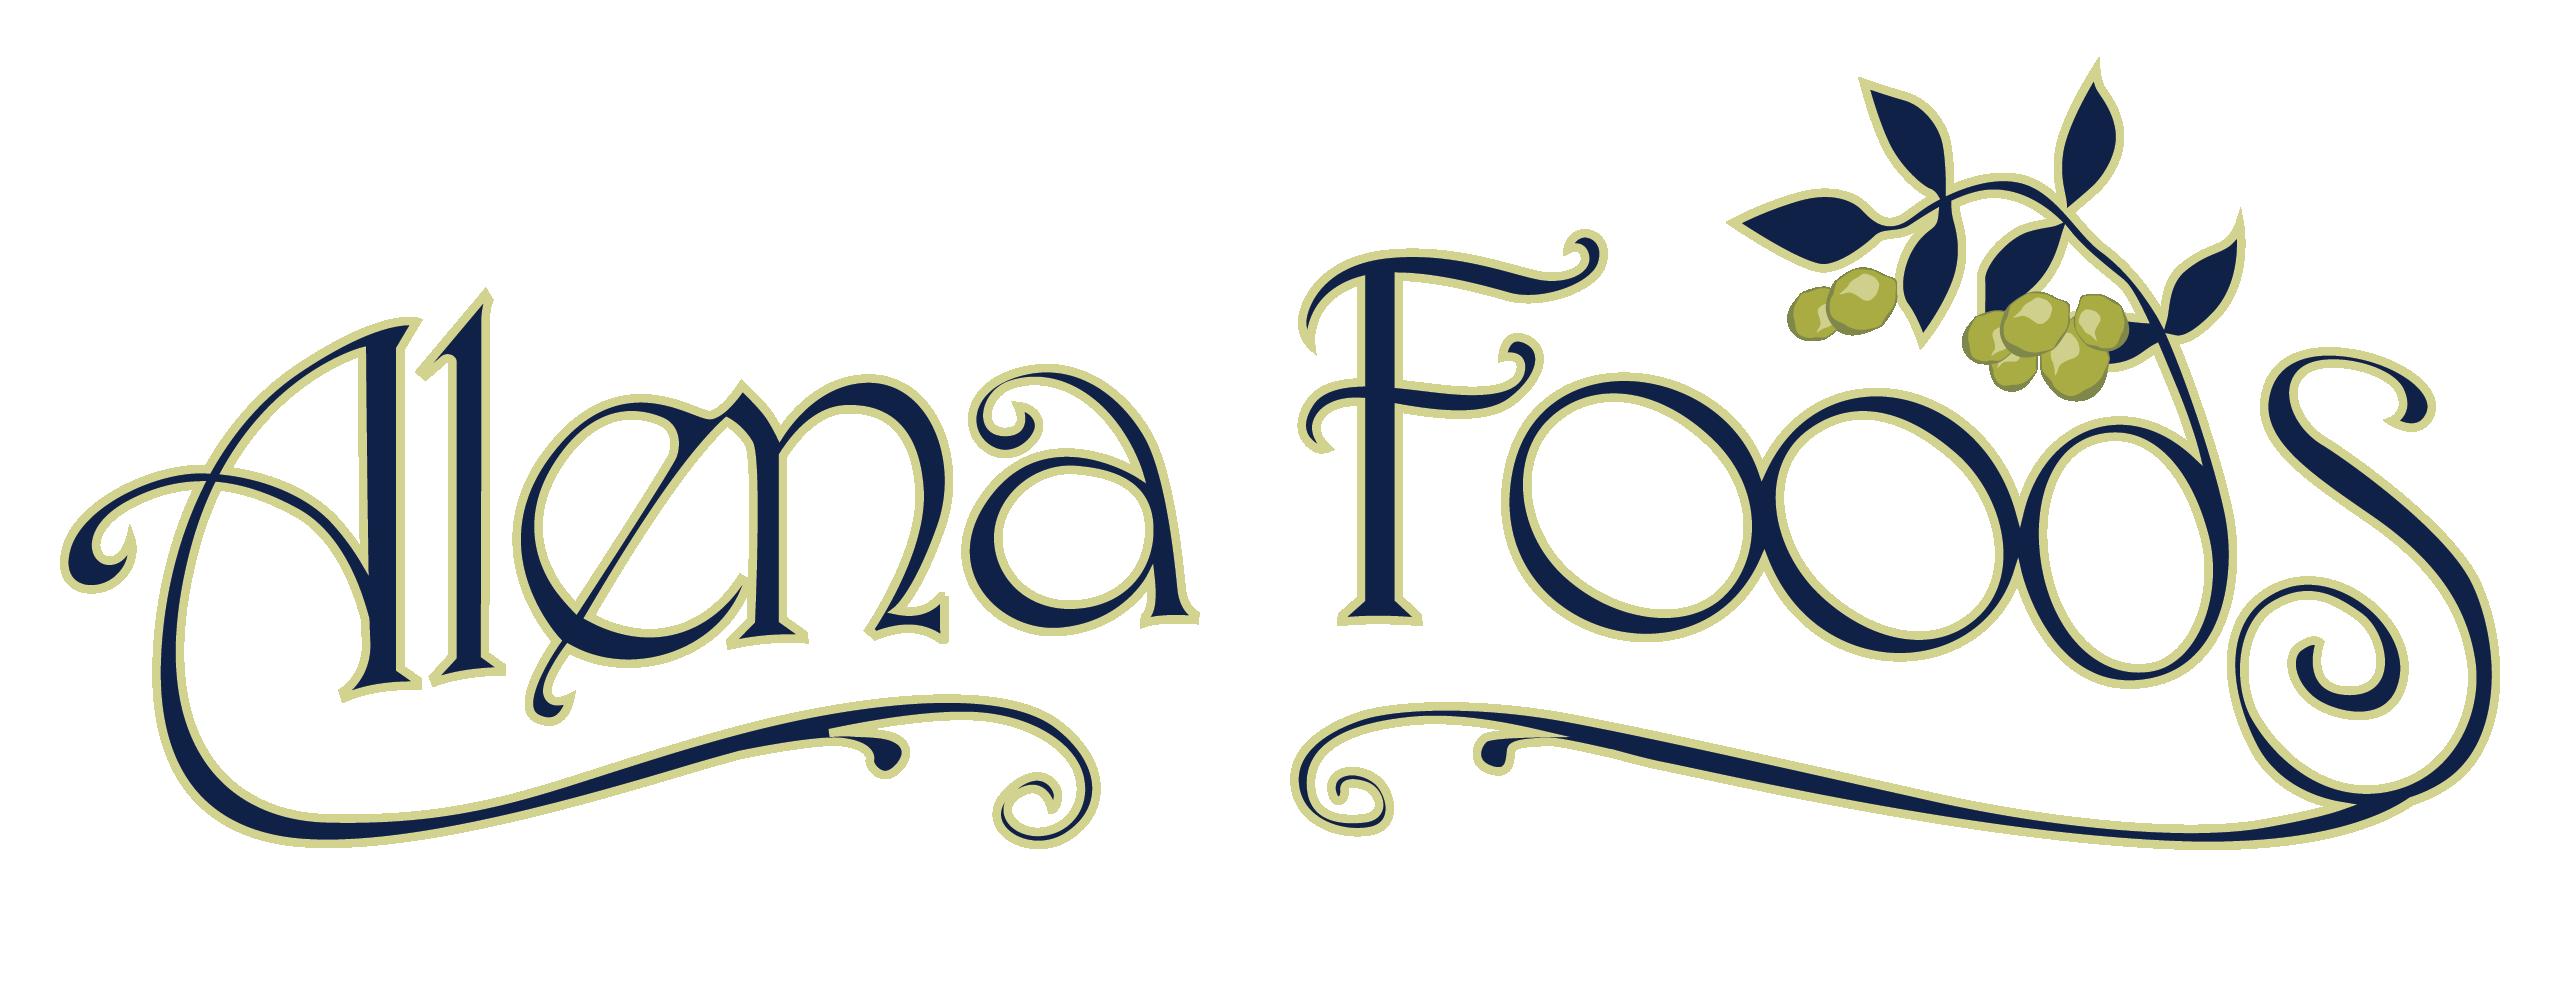 Alena Foods